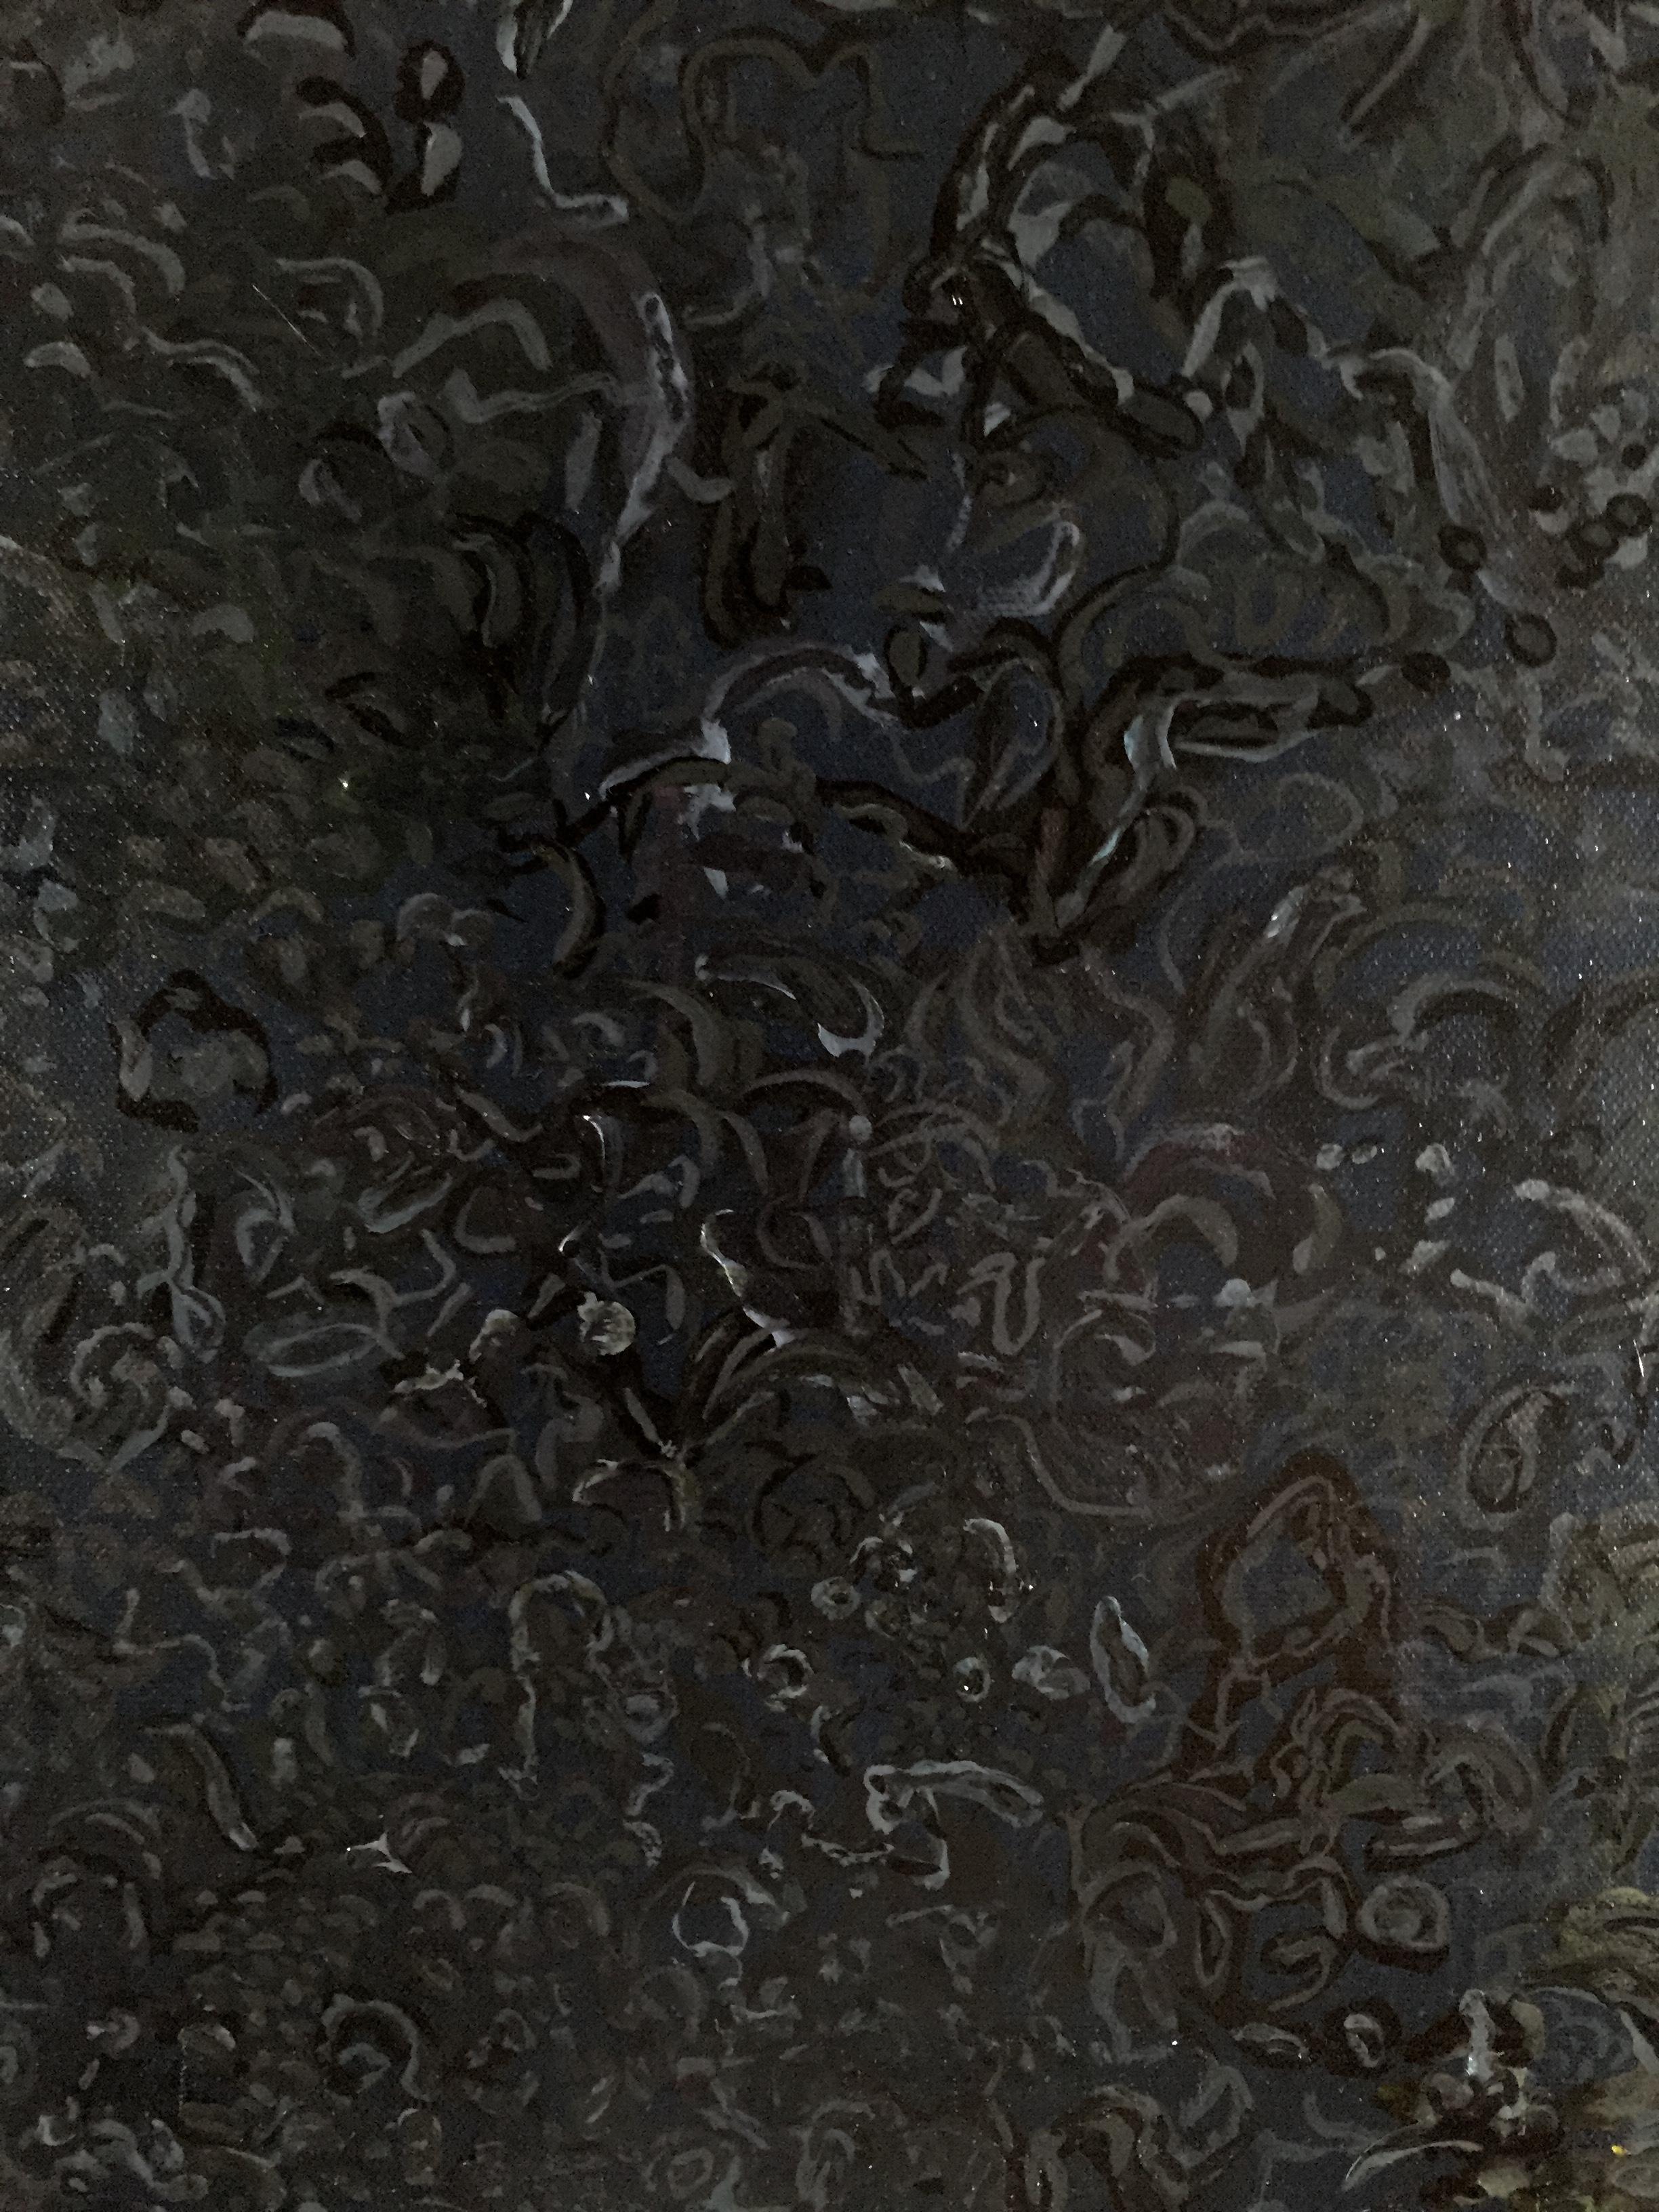 Lucifer's Daydream (detail)